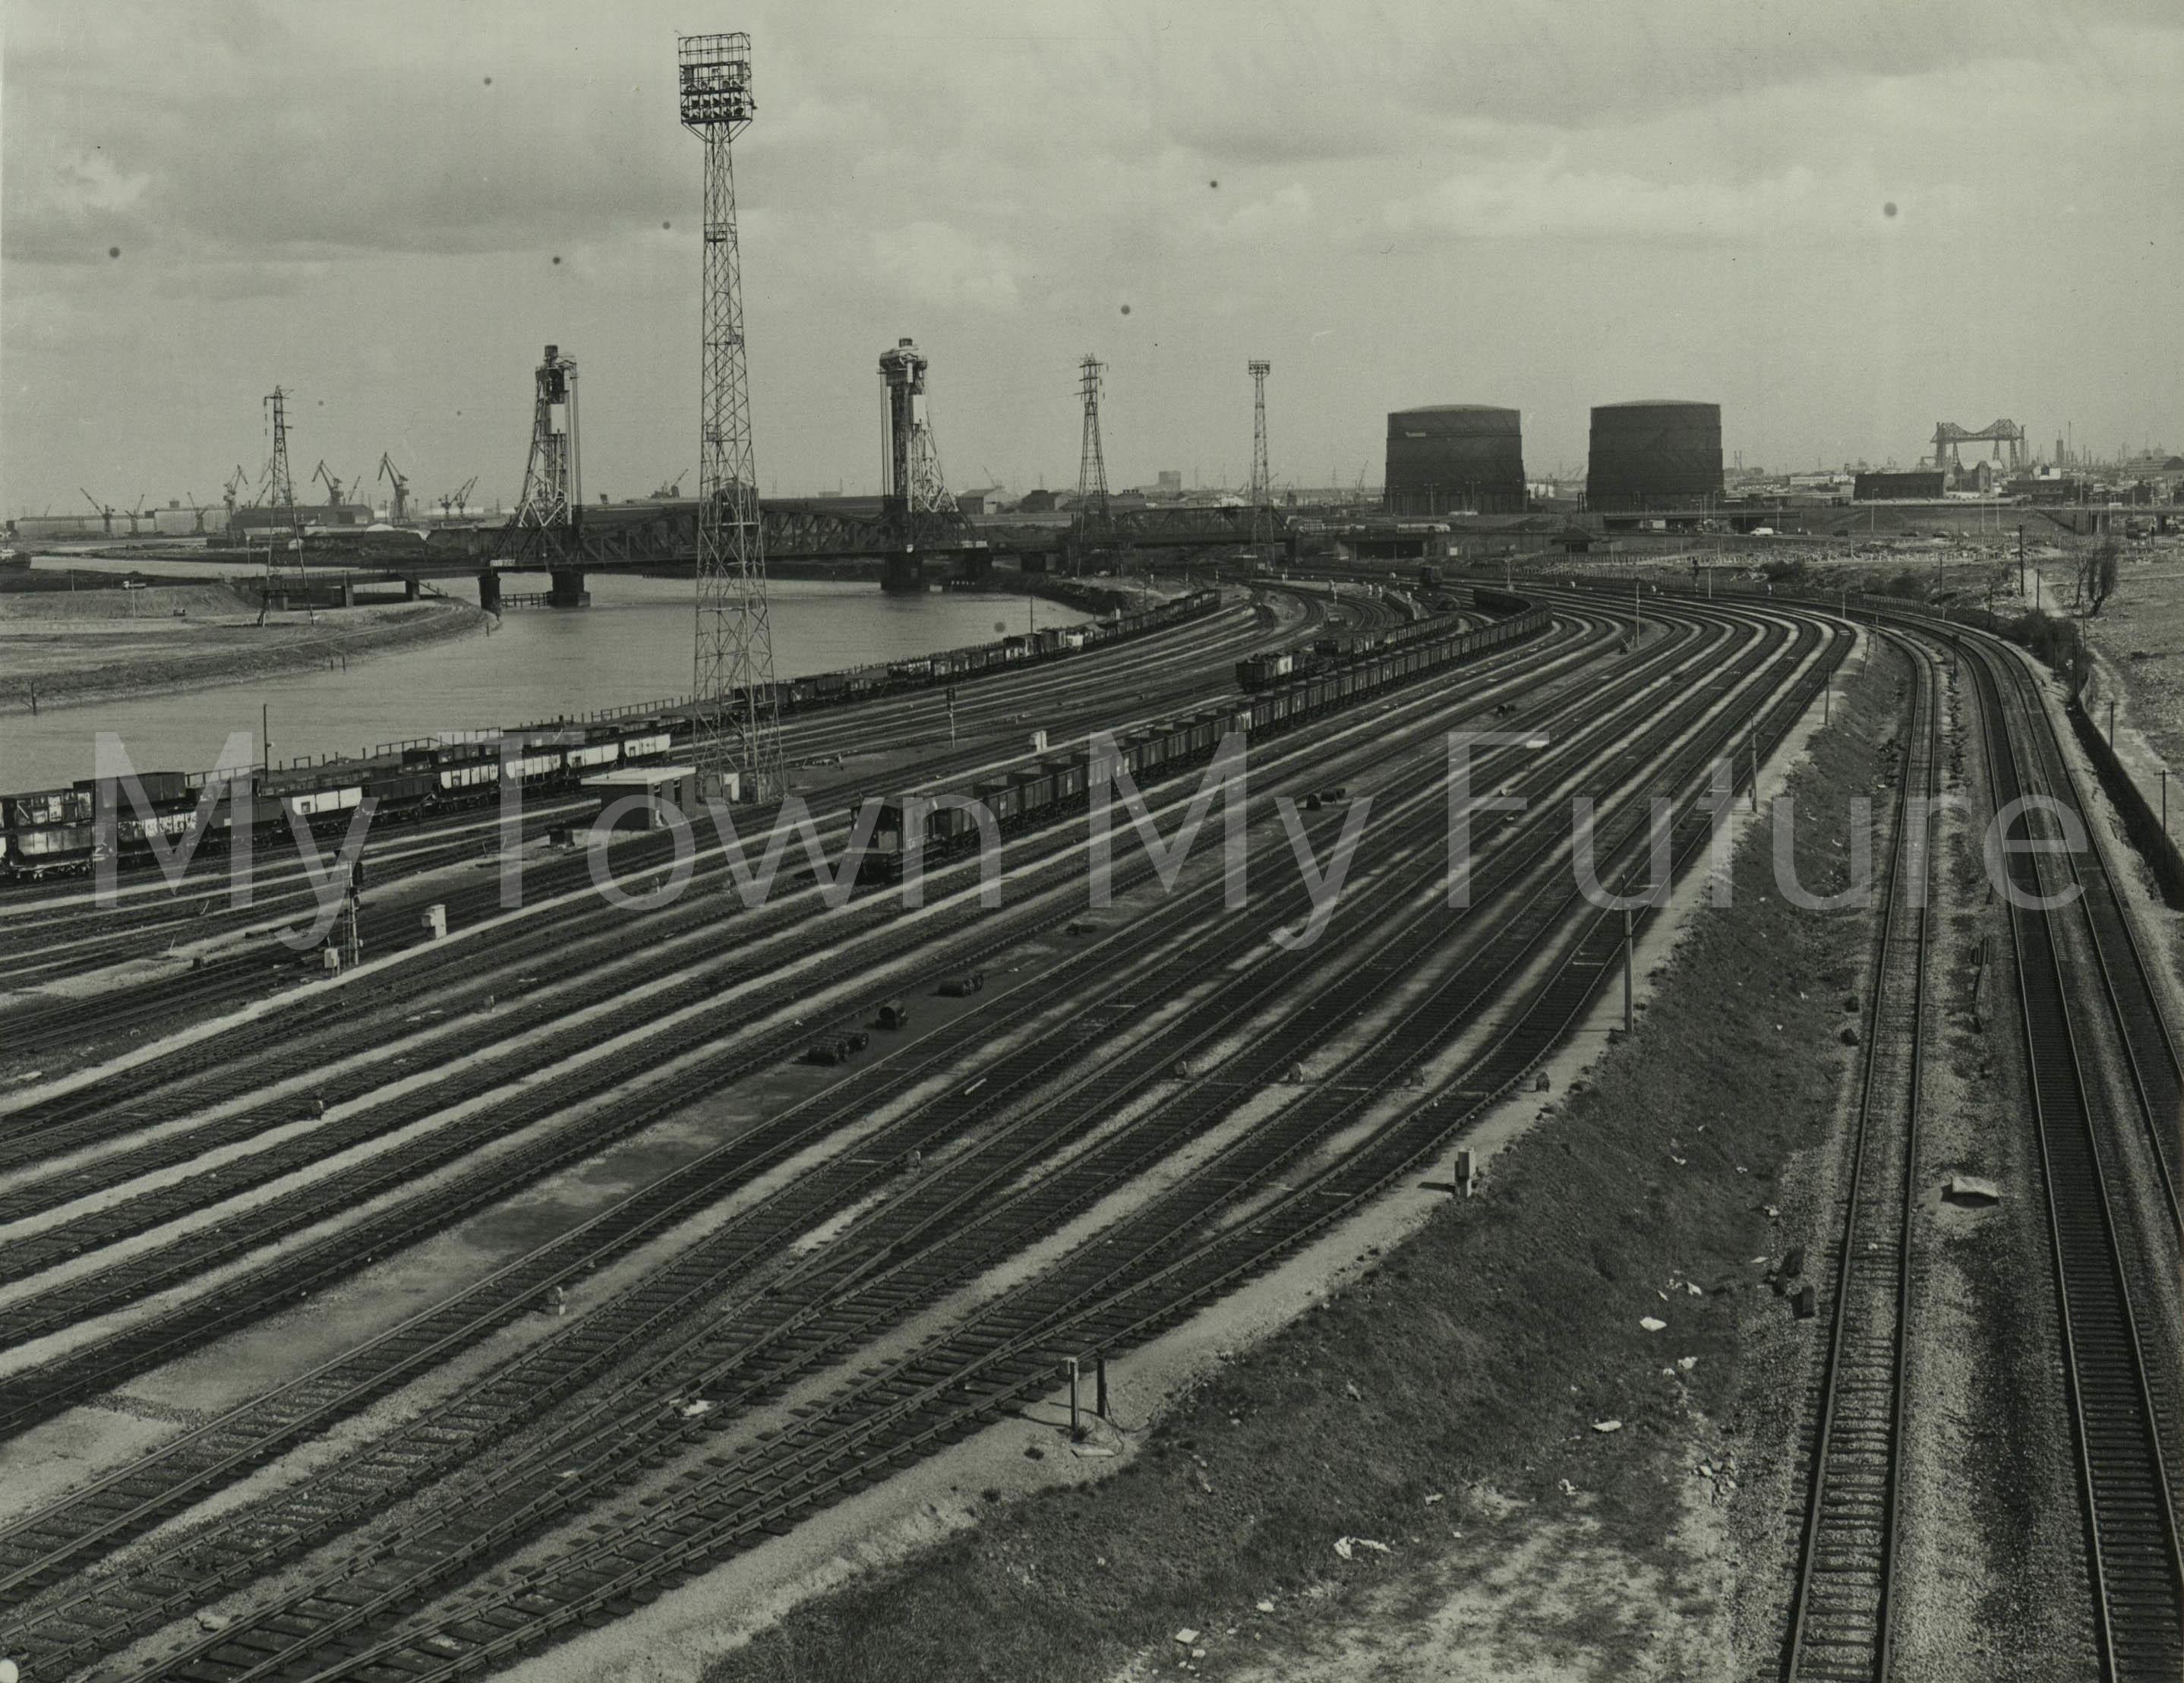 Railway Marshalling Yards